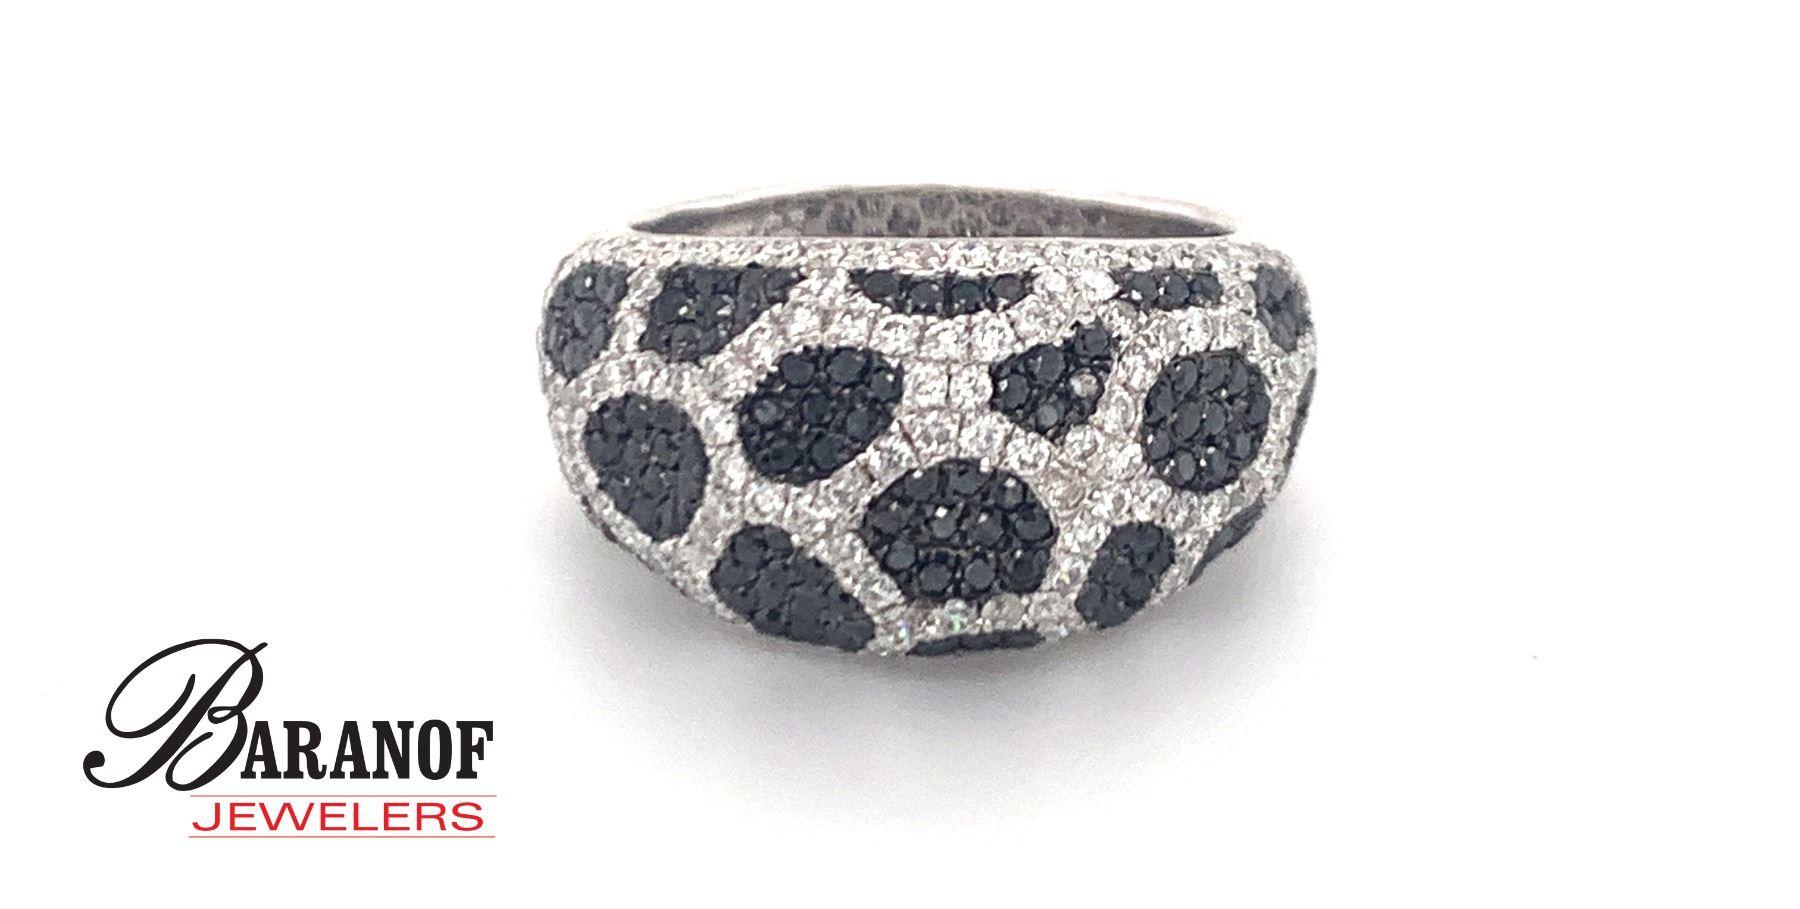 NATURAL BLACK & WHITE DIAMOND RING